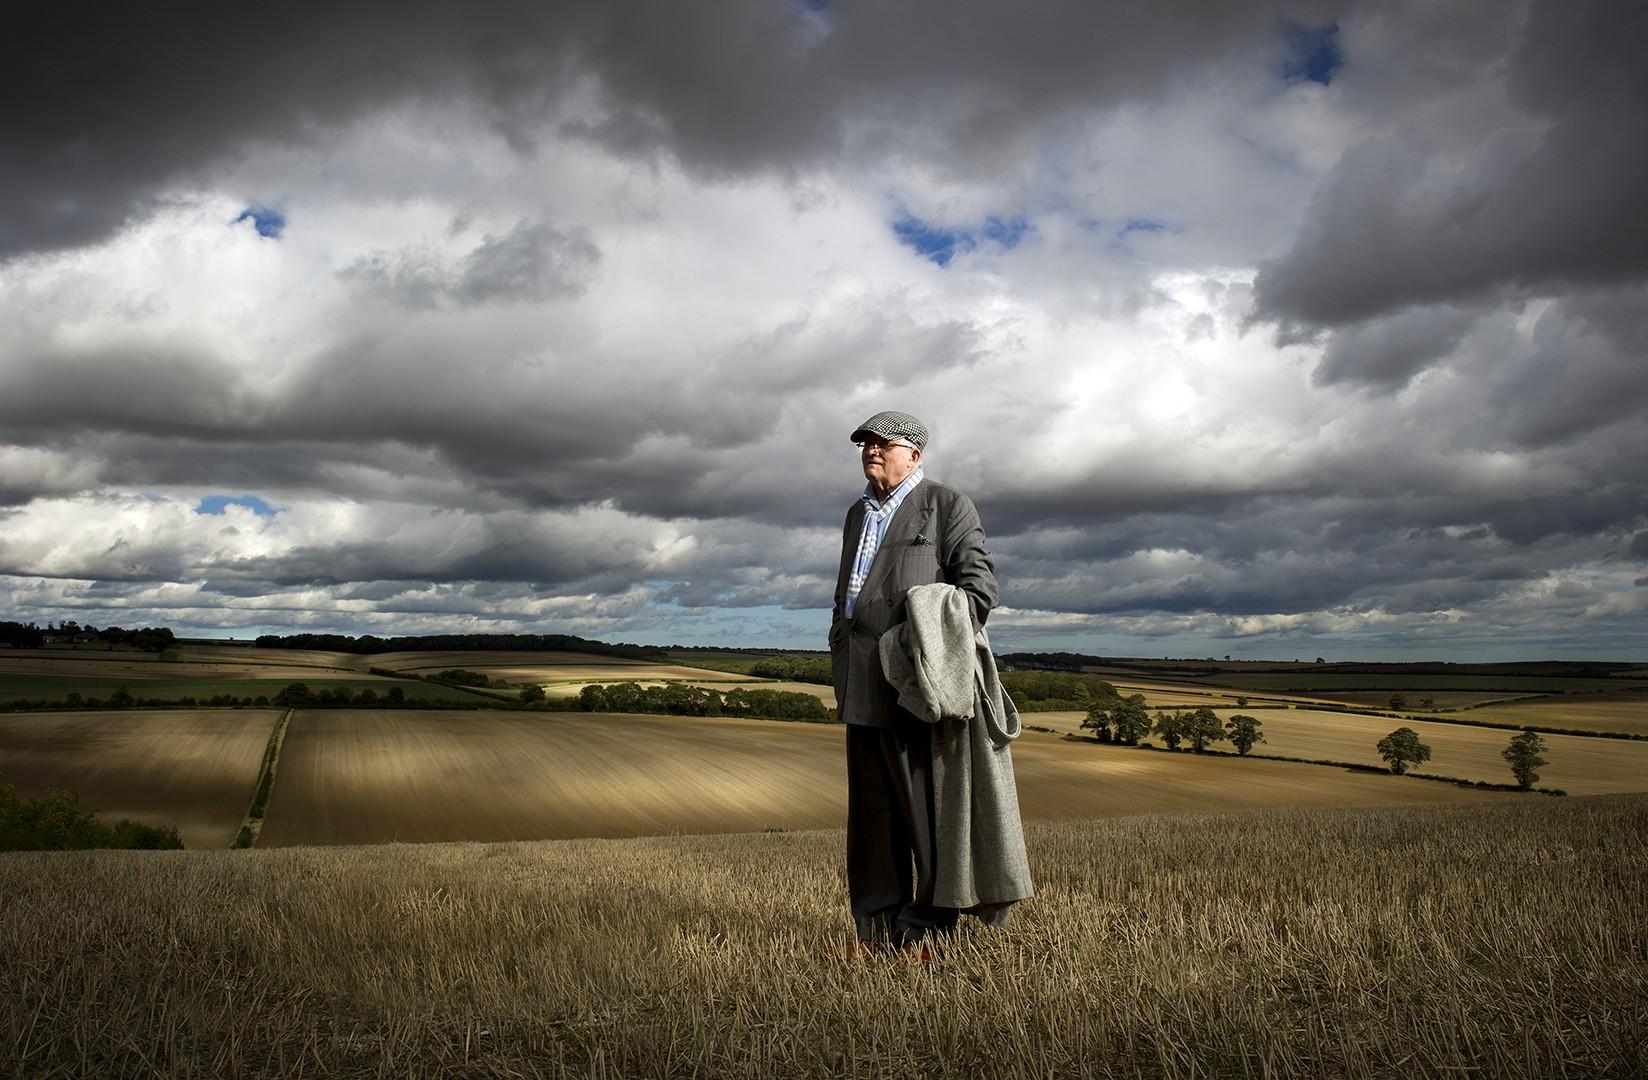 JohnnyMillar_Photography_Portrait_David Hockney North Yorkshire Autumn 2011